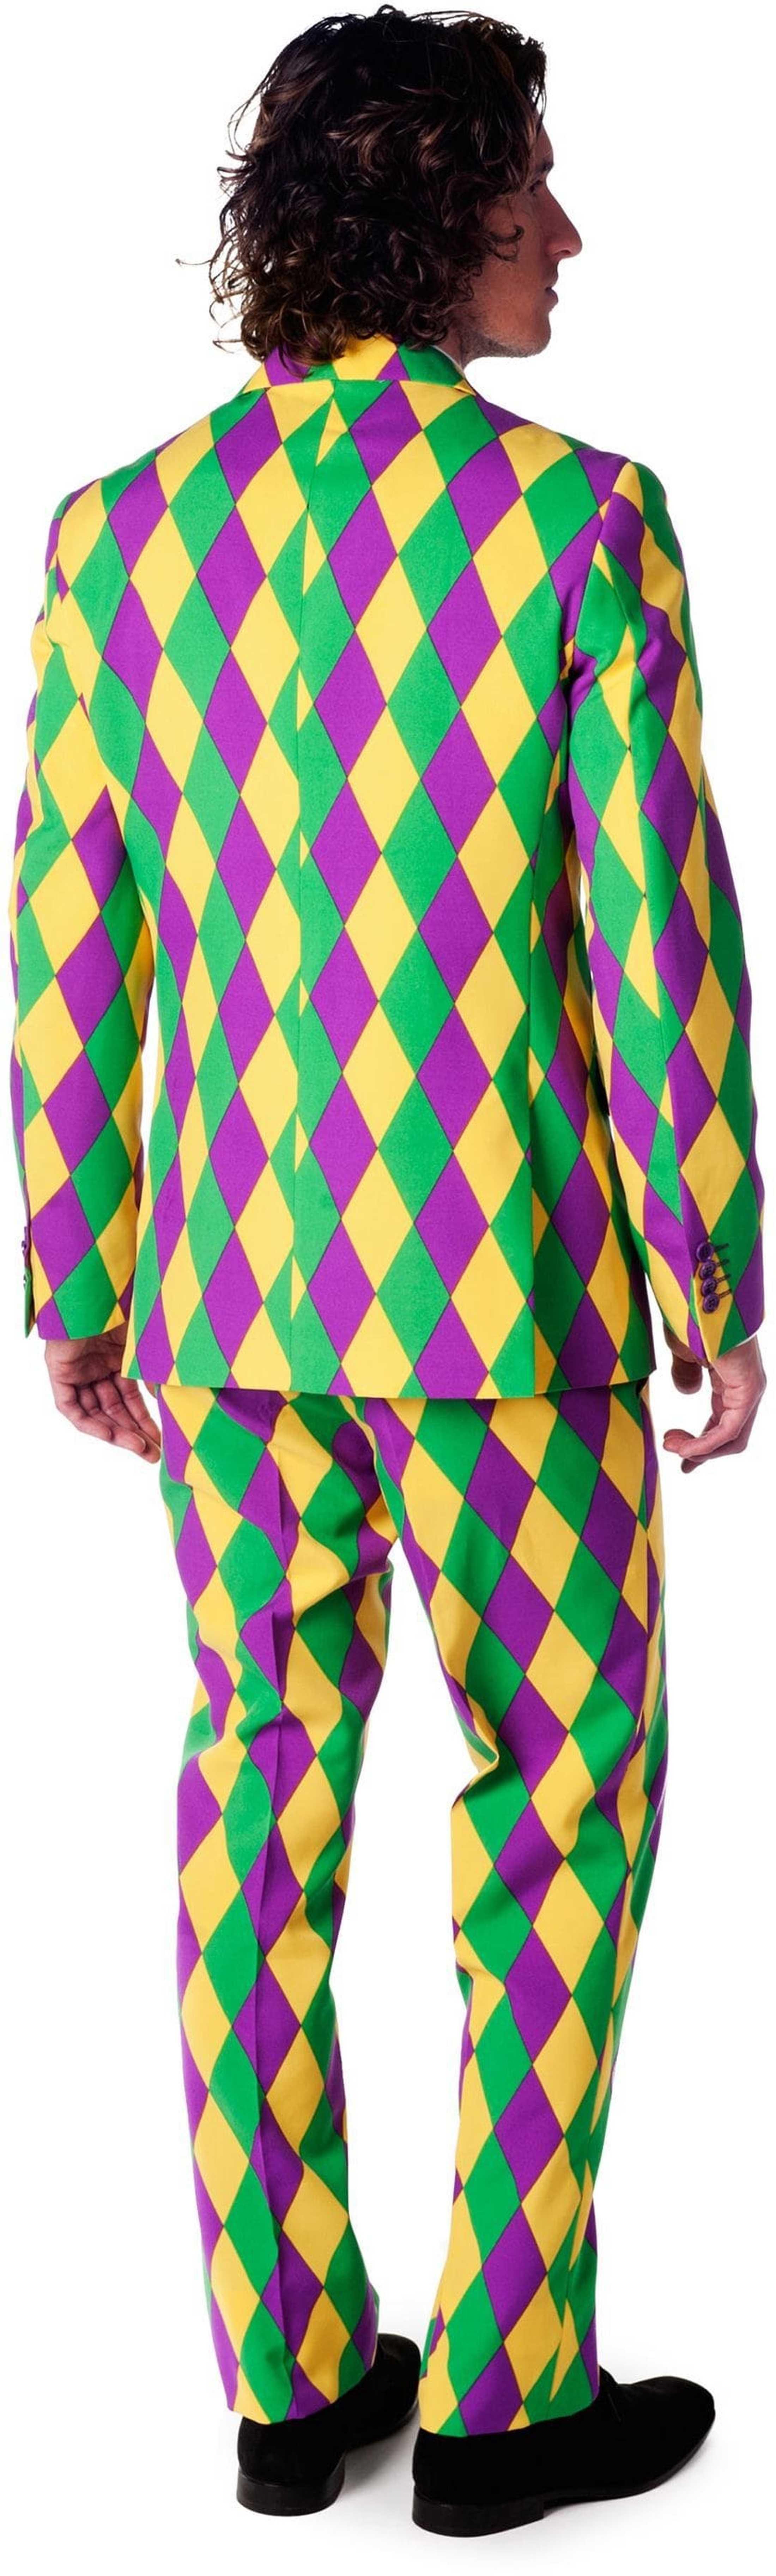 OppoSuits Harleking Kostüm Foto 1